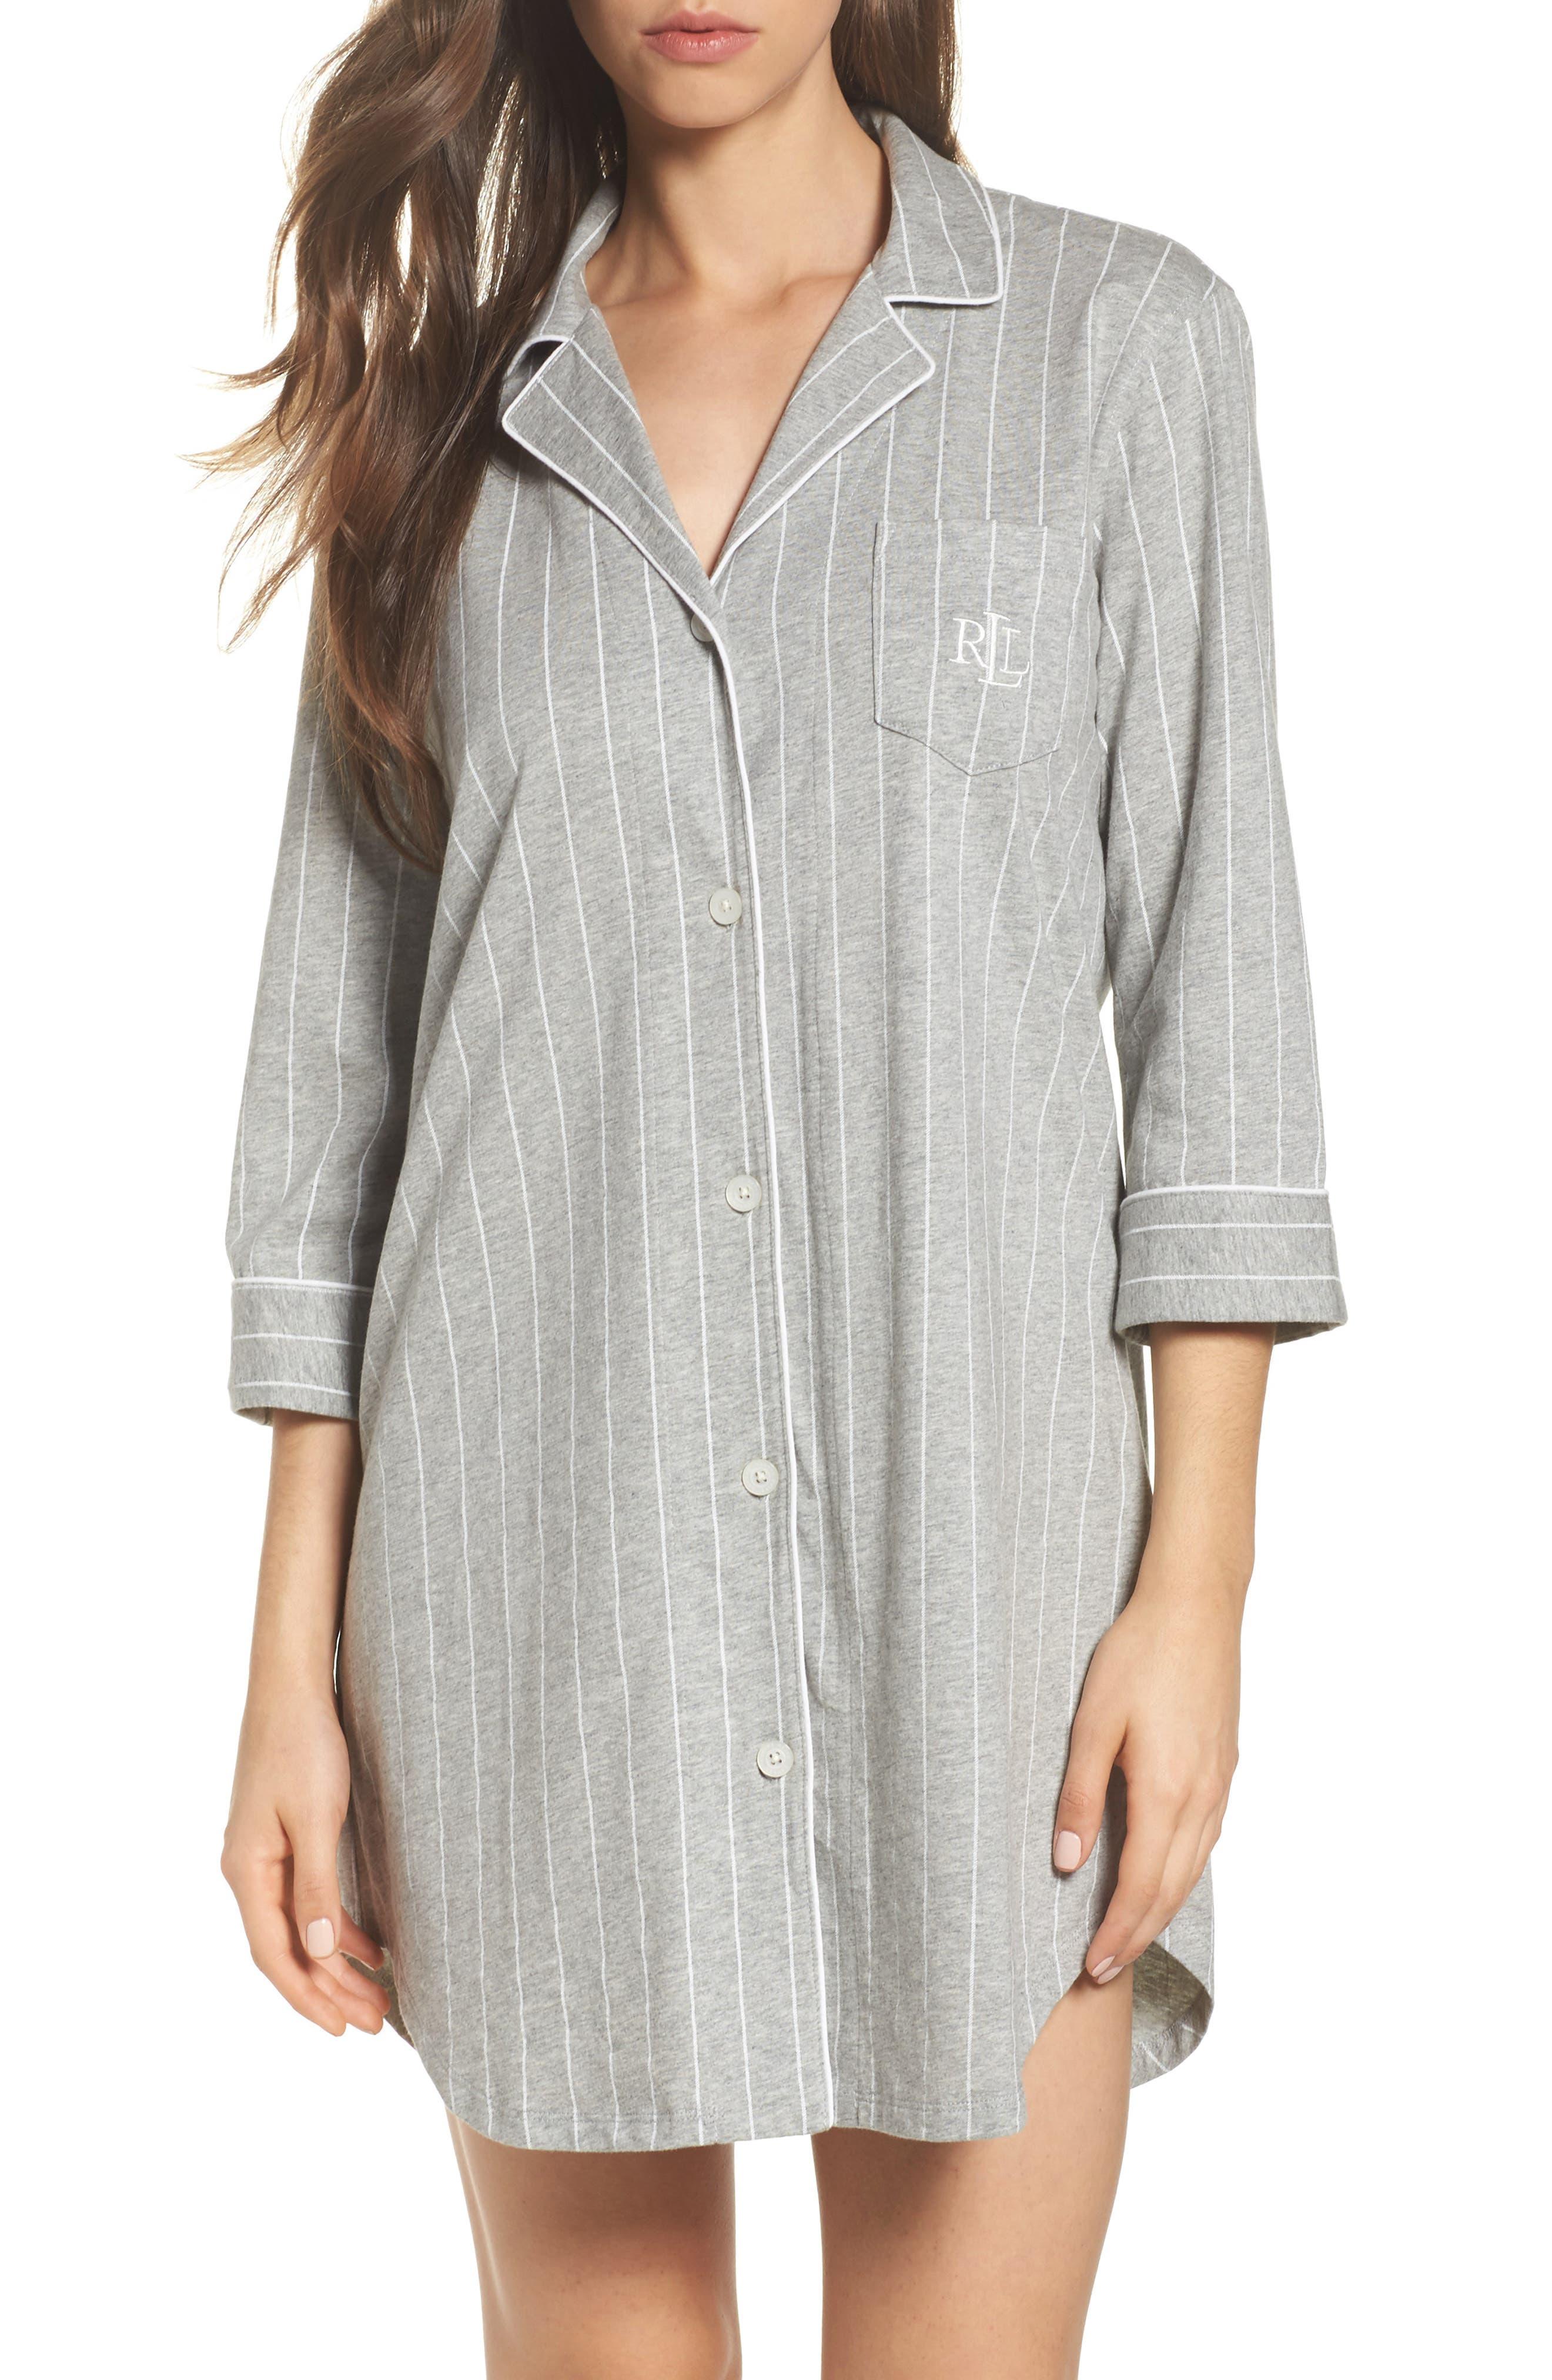 Lauren Ralph Lauren Cotton Jersey Sleep Shirt, Grey (Online Only)